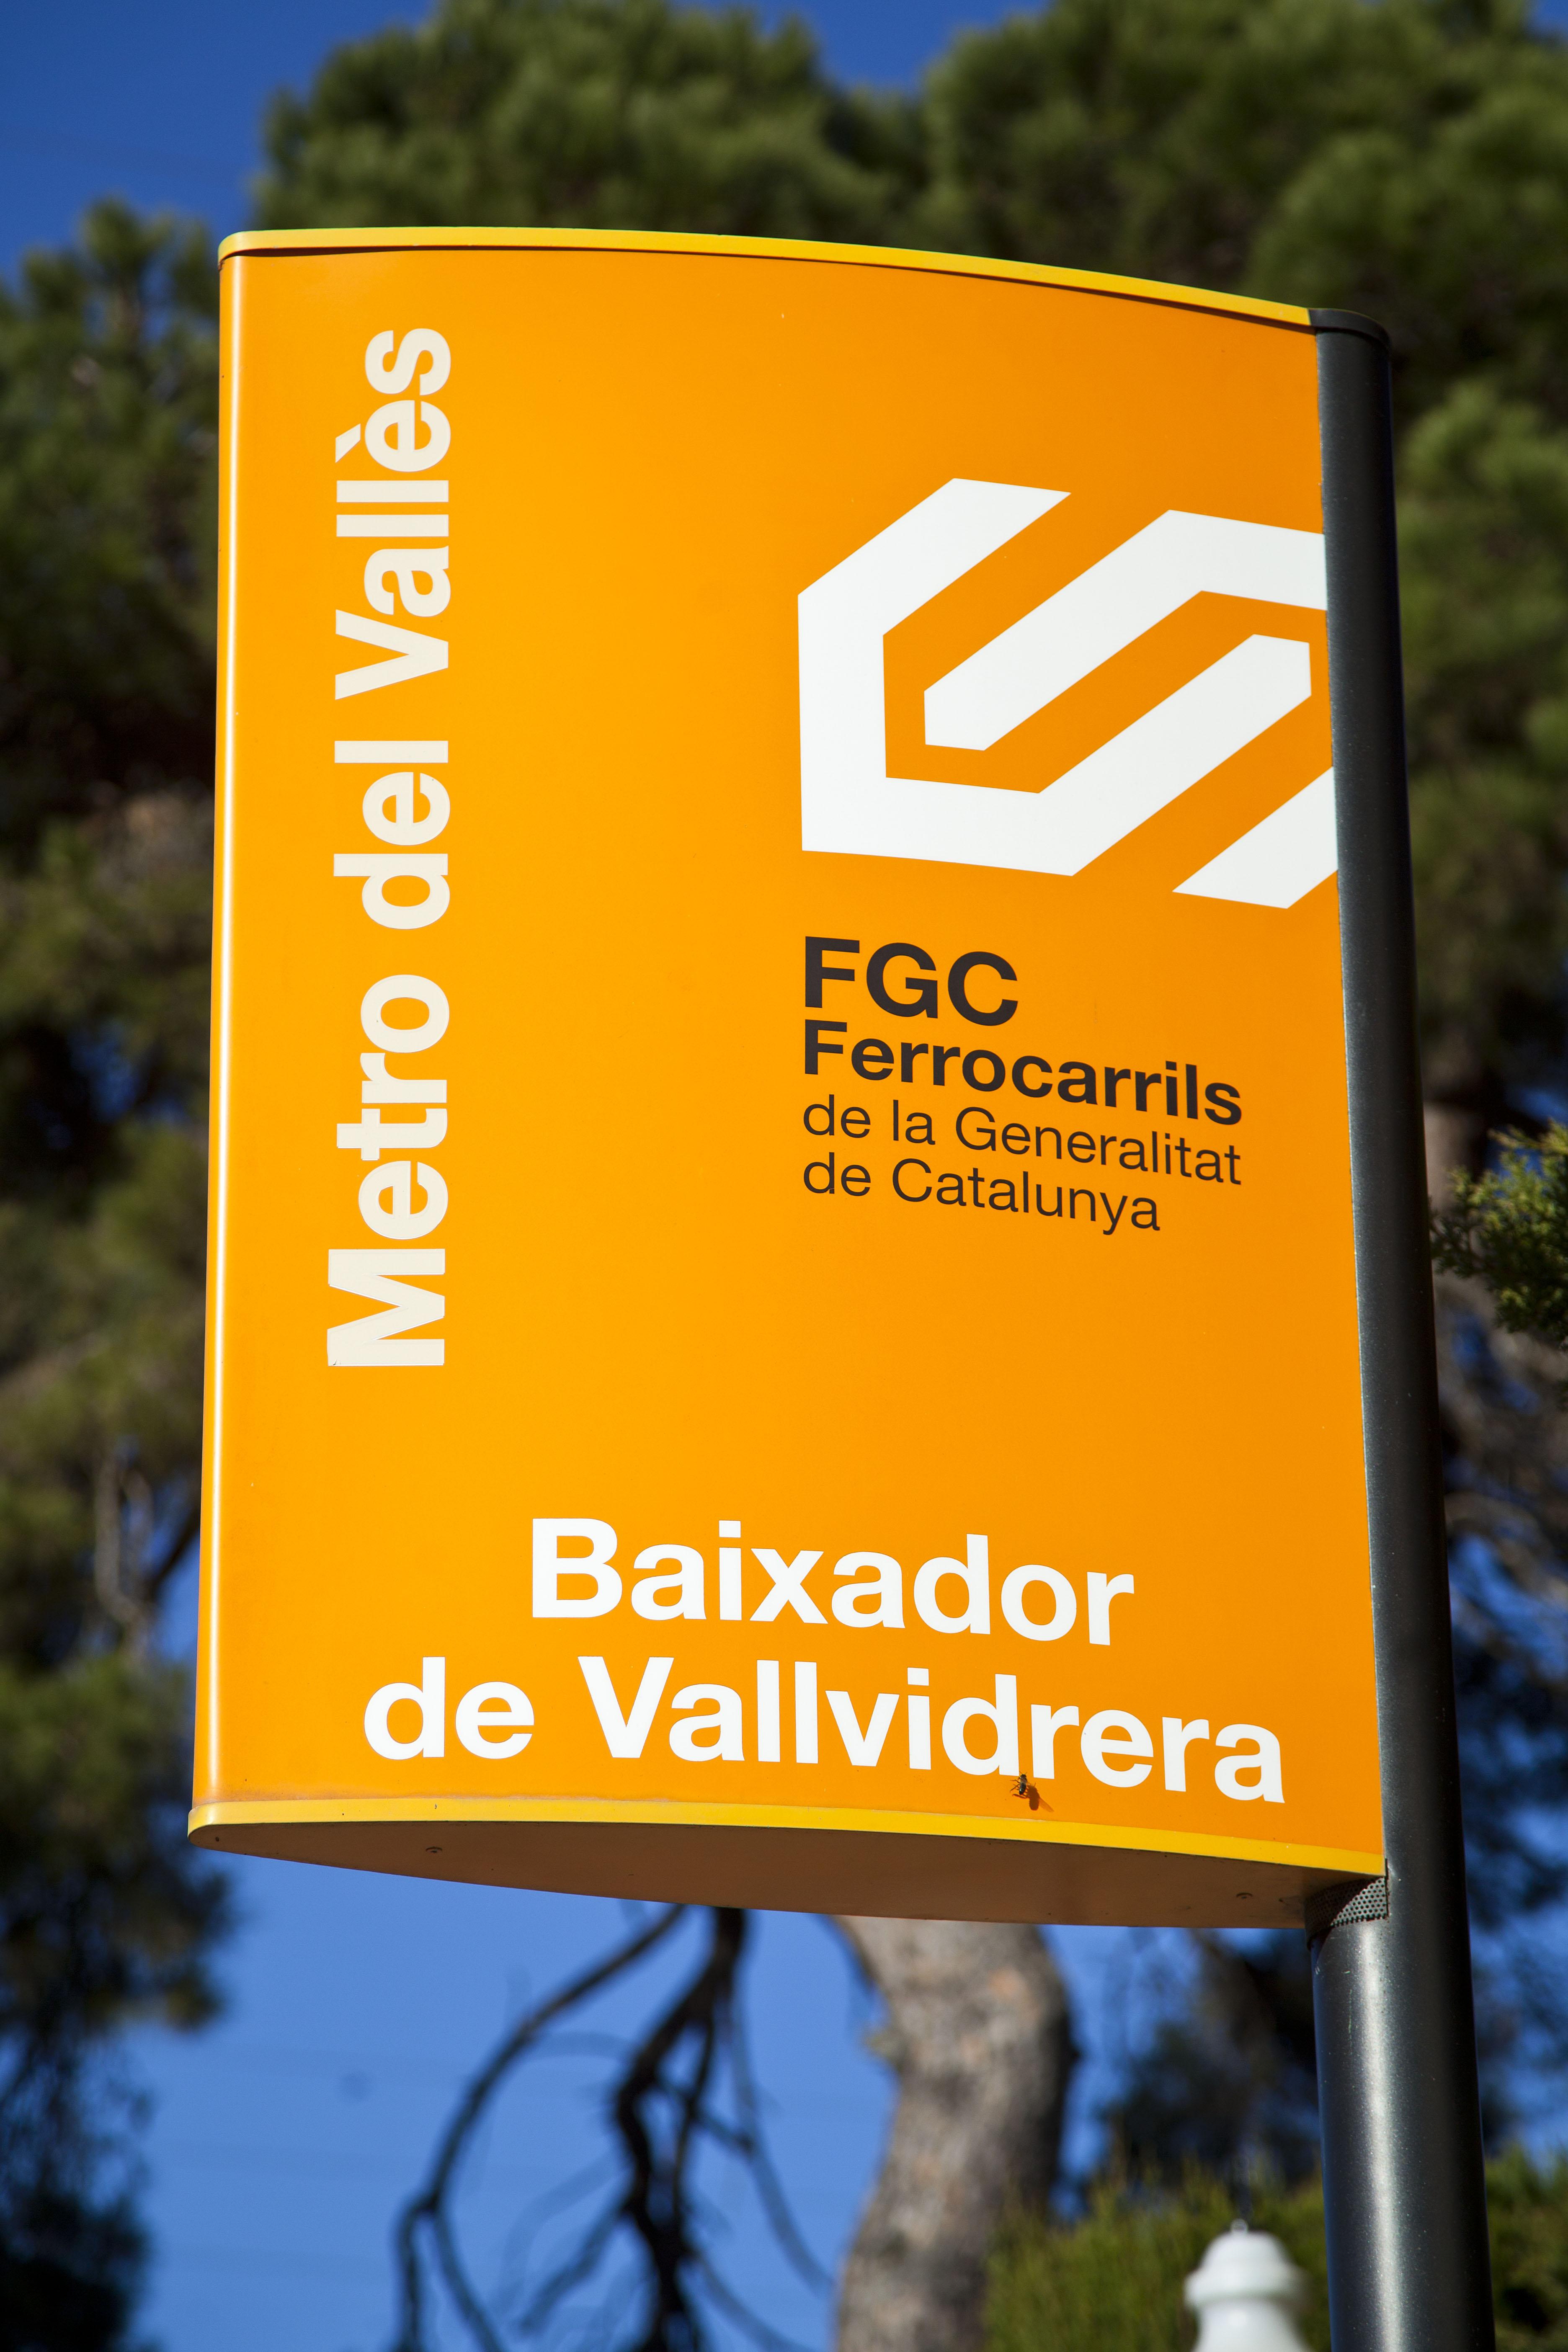 BAIXADOR -DE -VALLVIDRERA -FGC